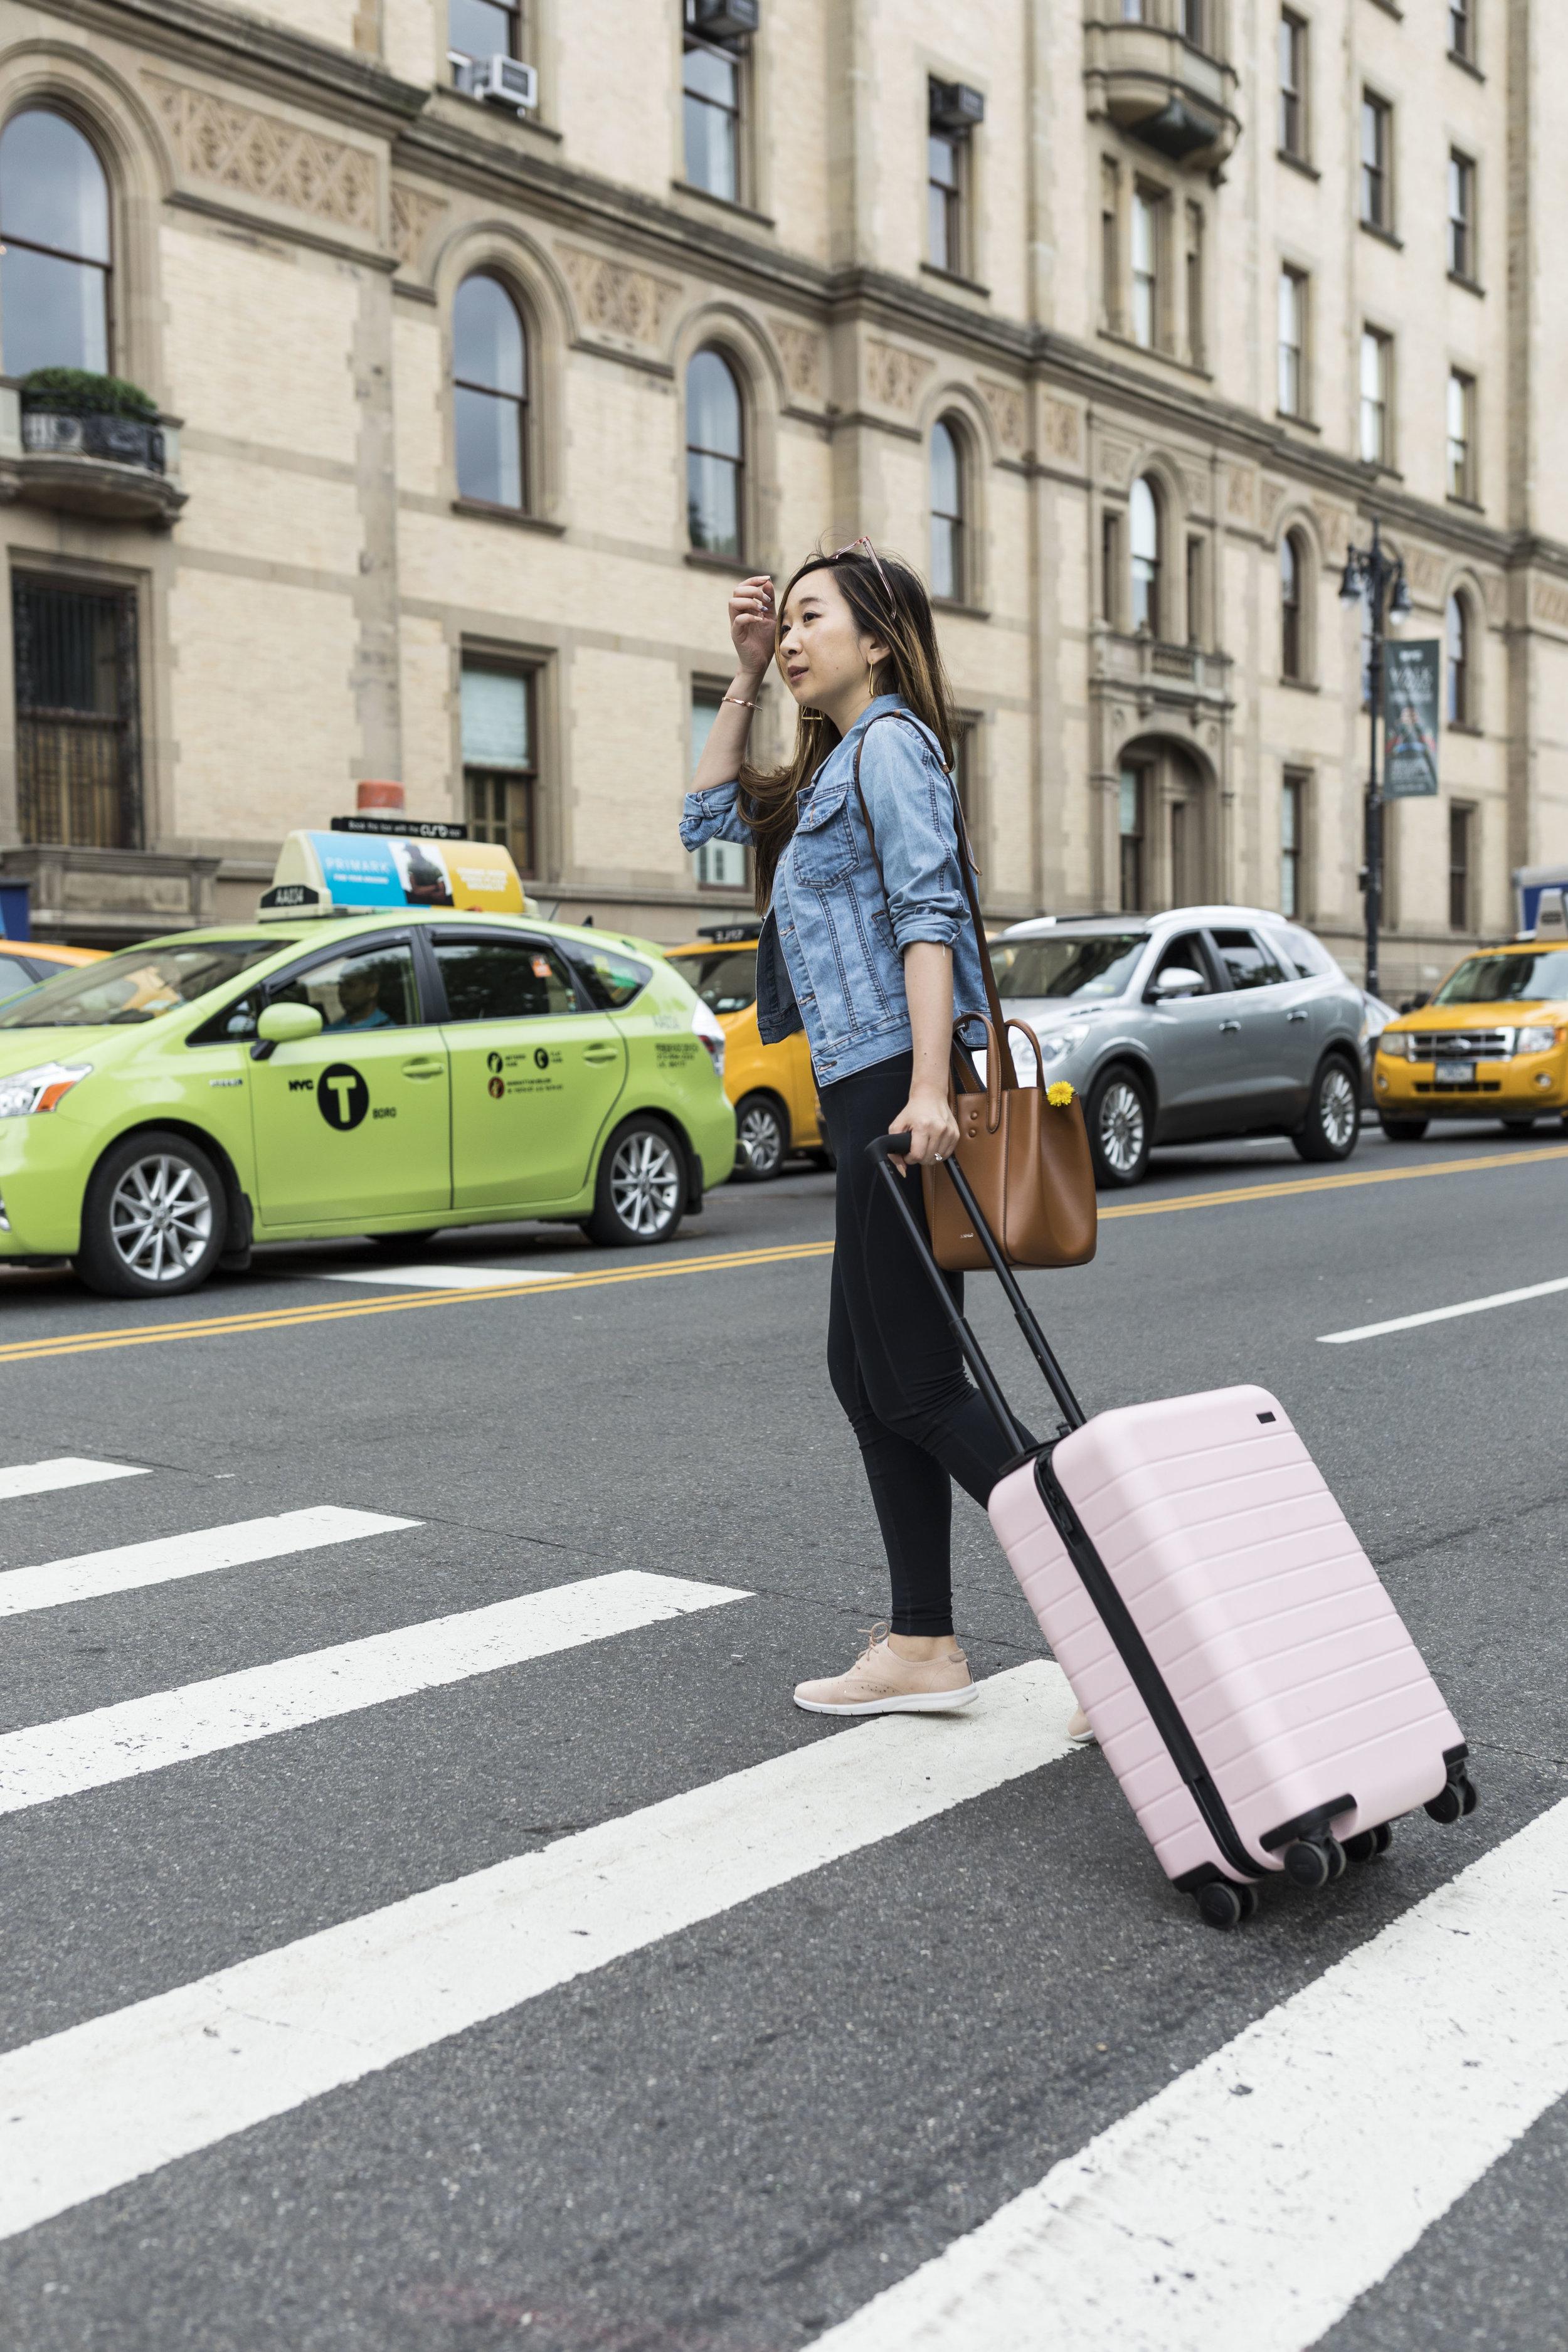 Suitcase: Away.